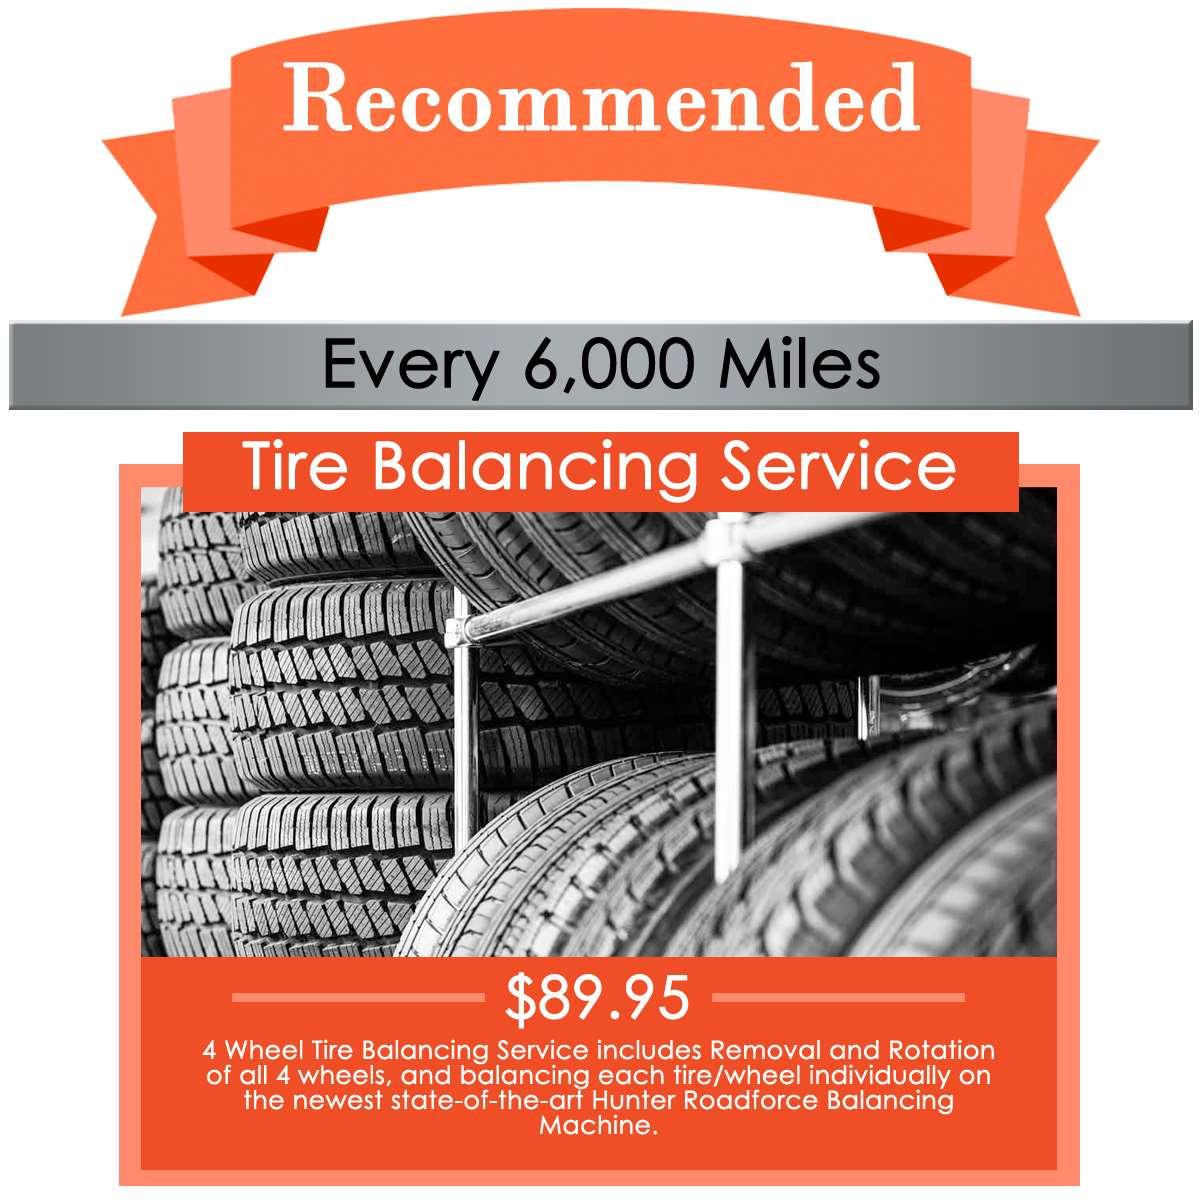 Tire Balancing Service